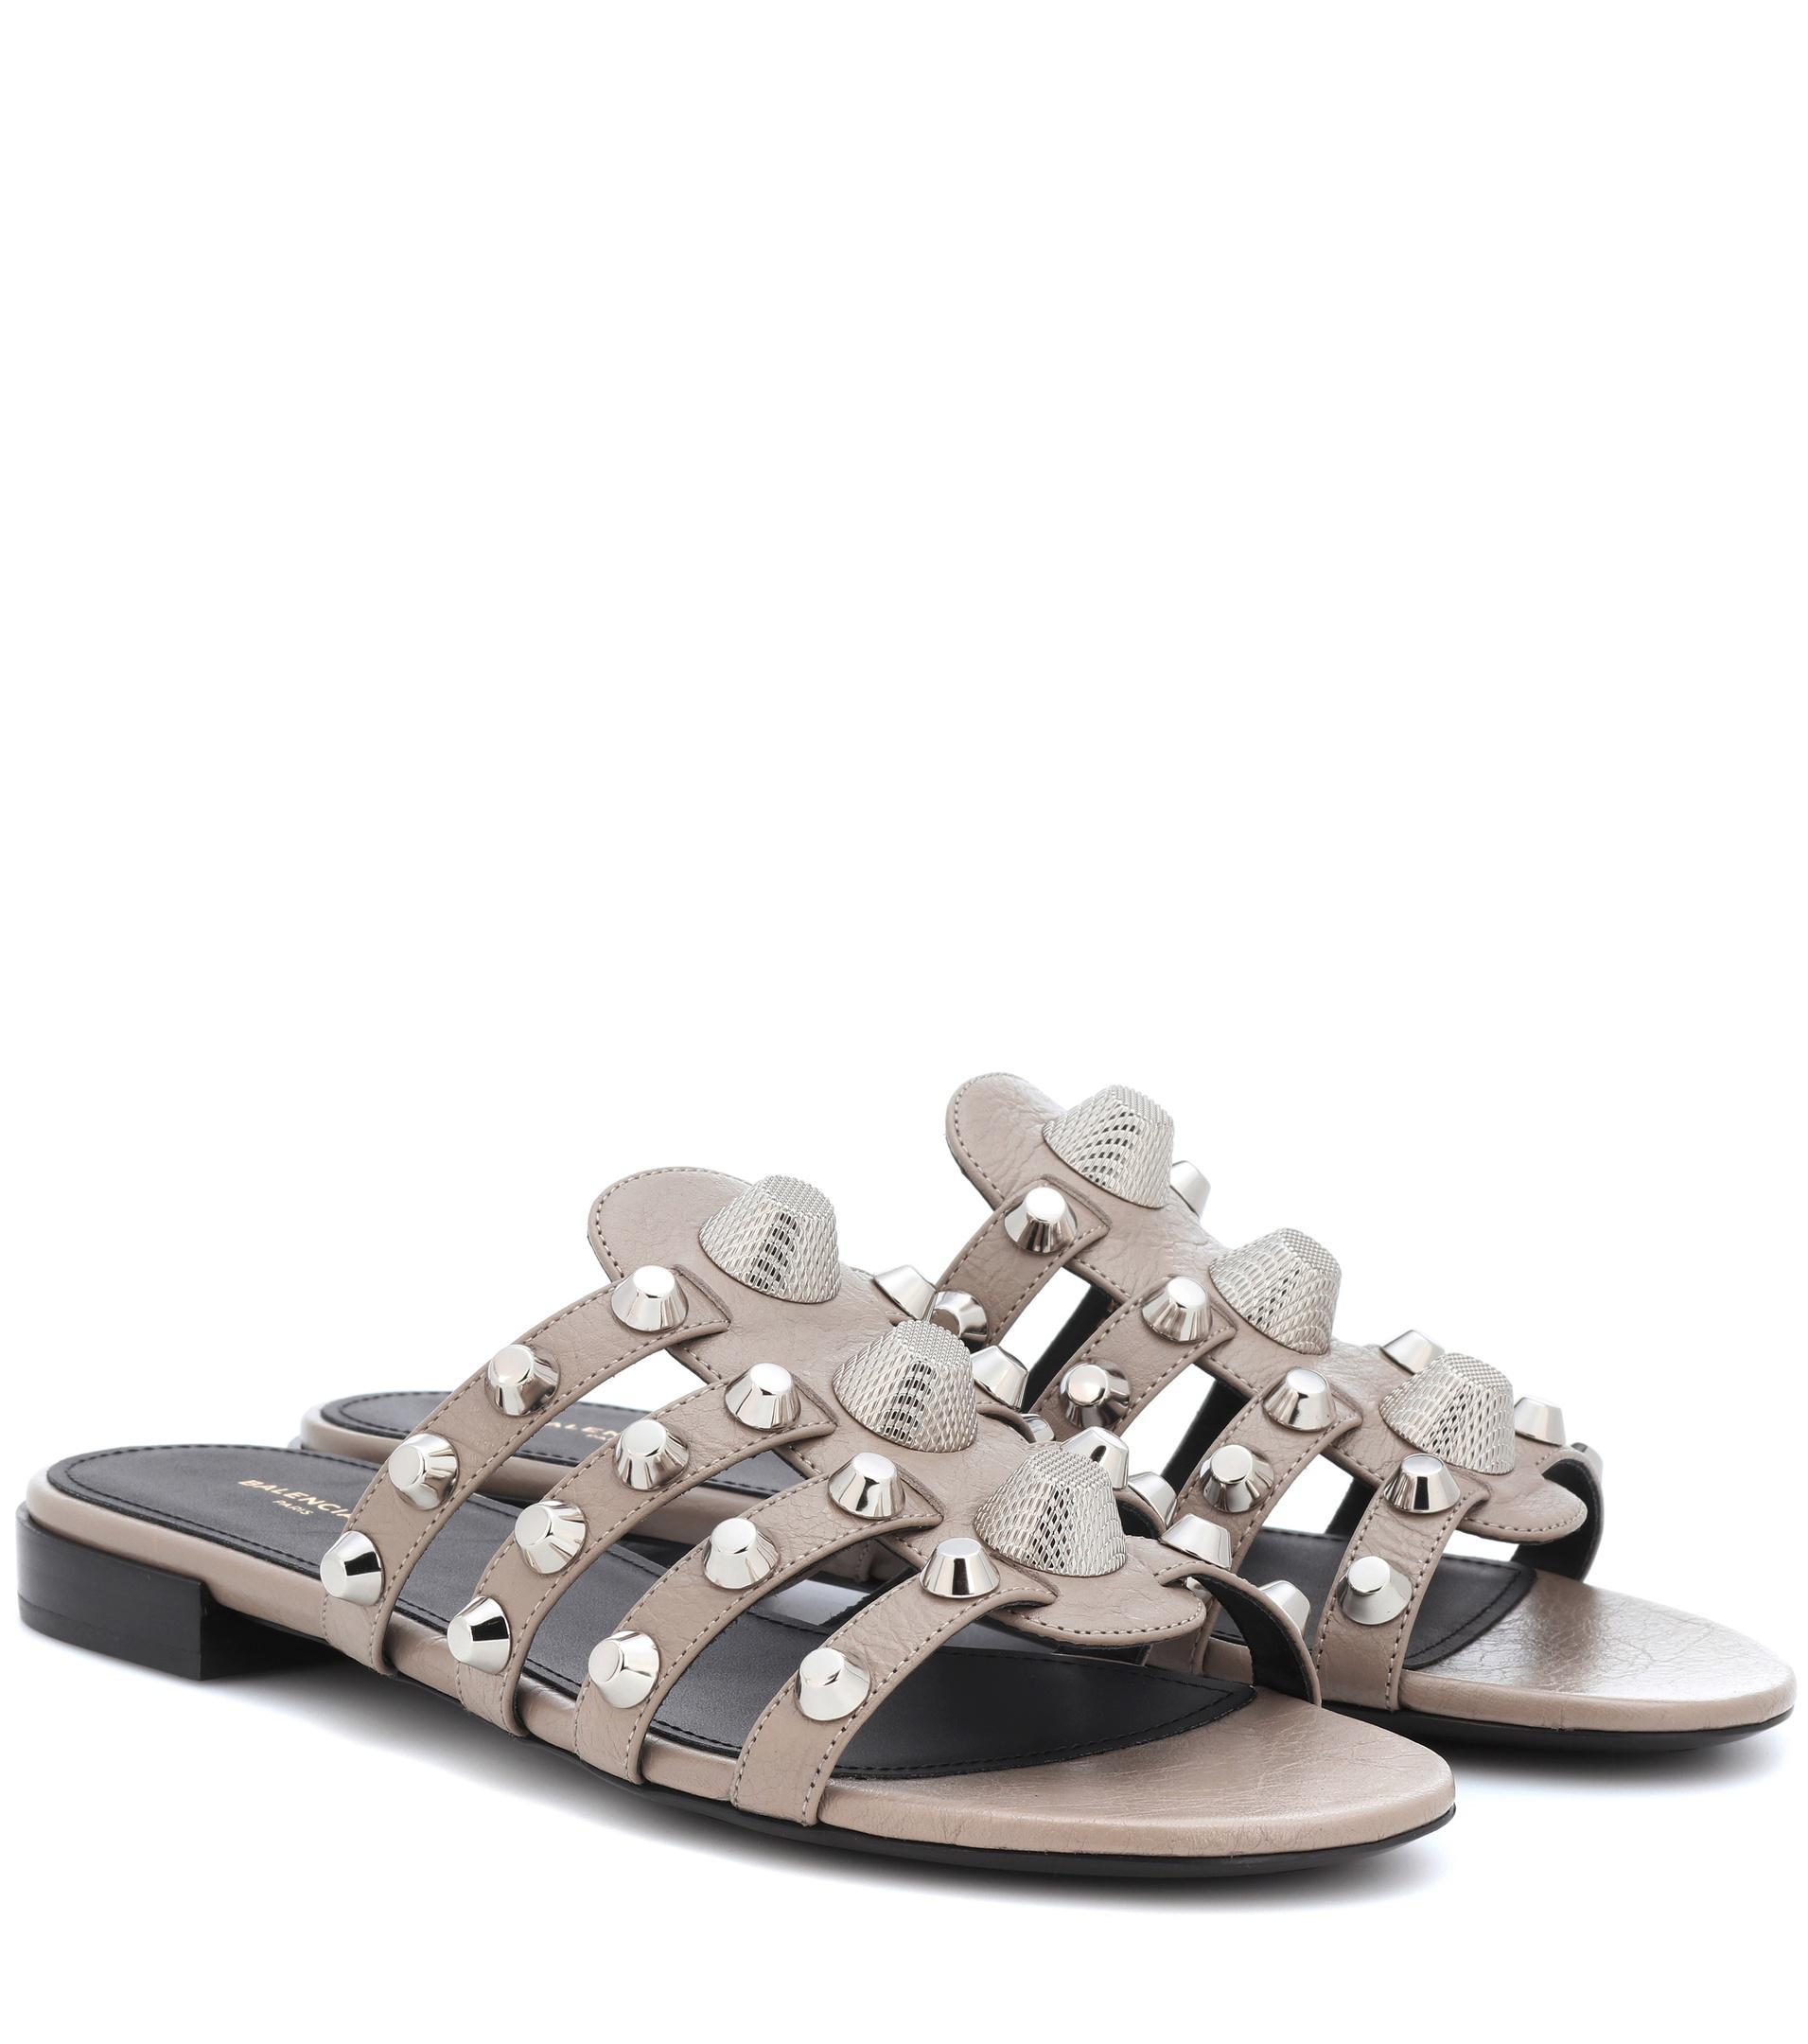 Balenciaga Sandals leather bronze metallic rivets